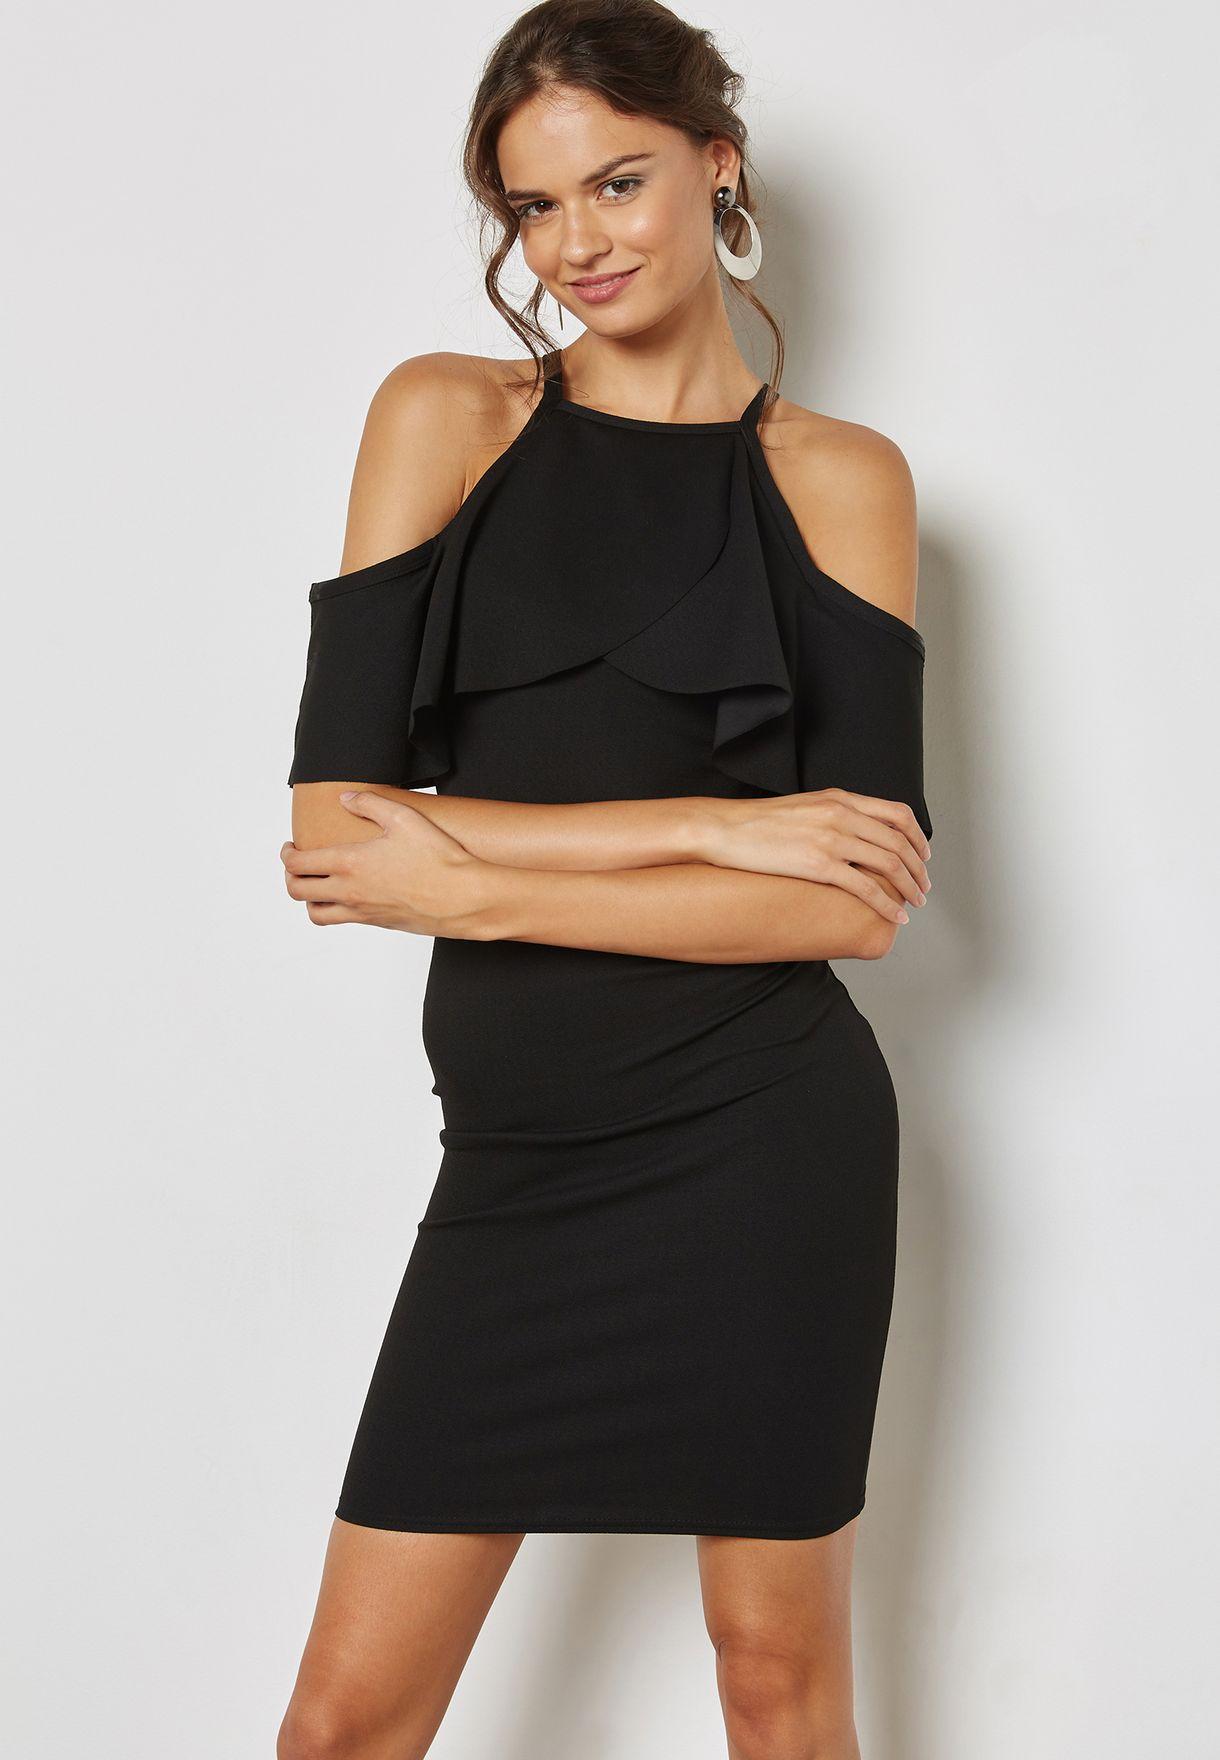 3ad3b8b0eb8 Shop Quiz black Ruffle Detail Cold Shoulder Bodycon Dress ...